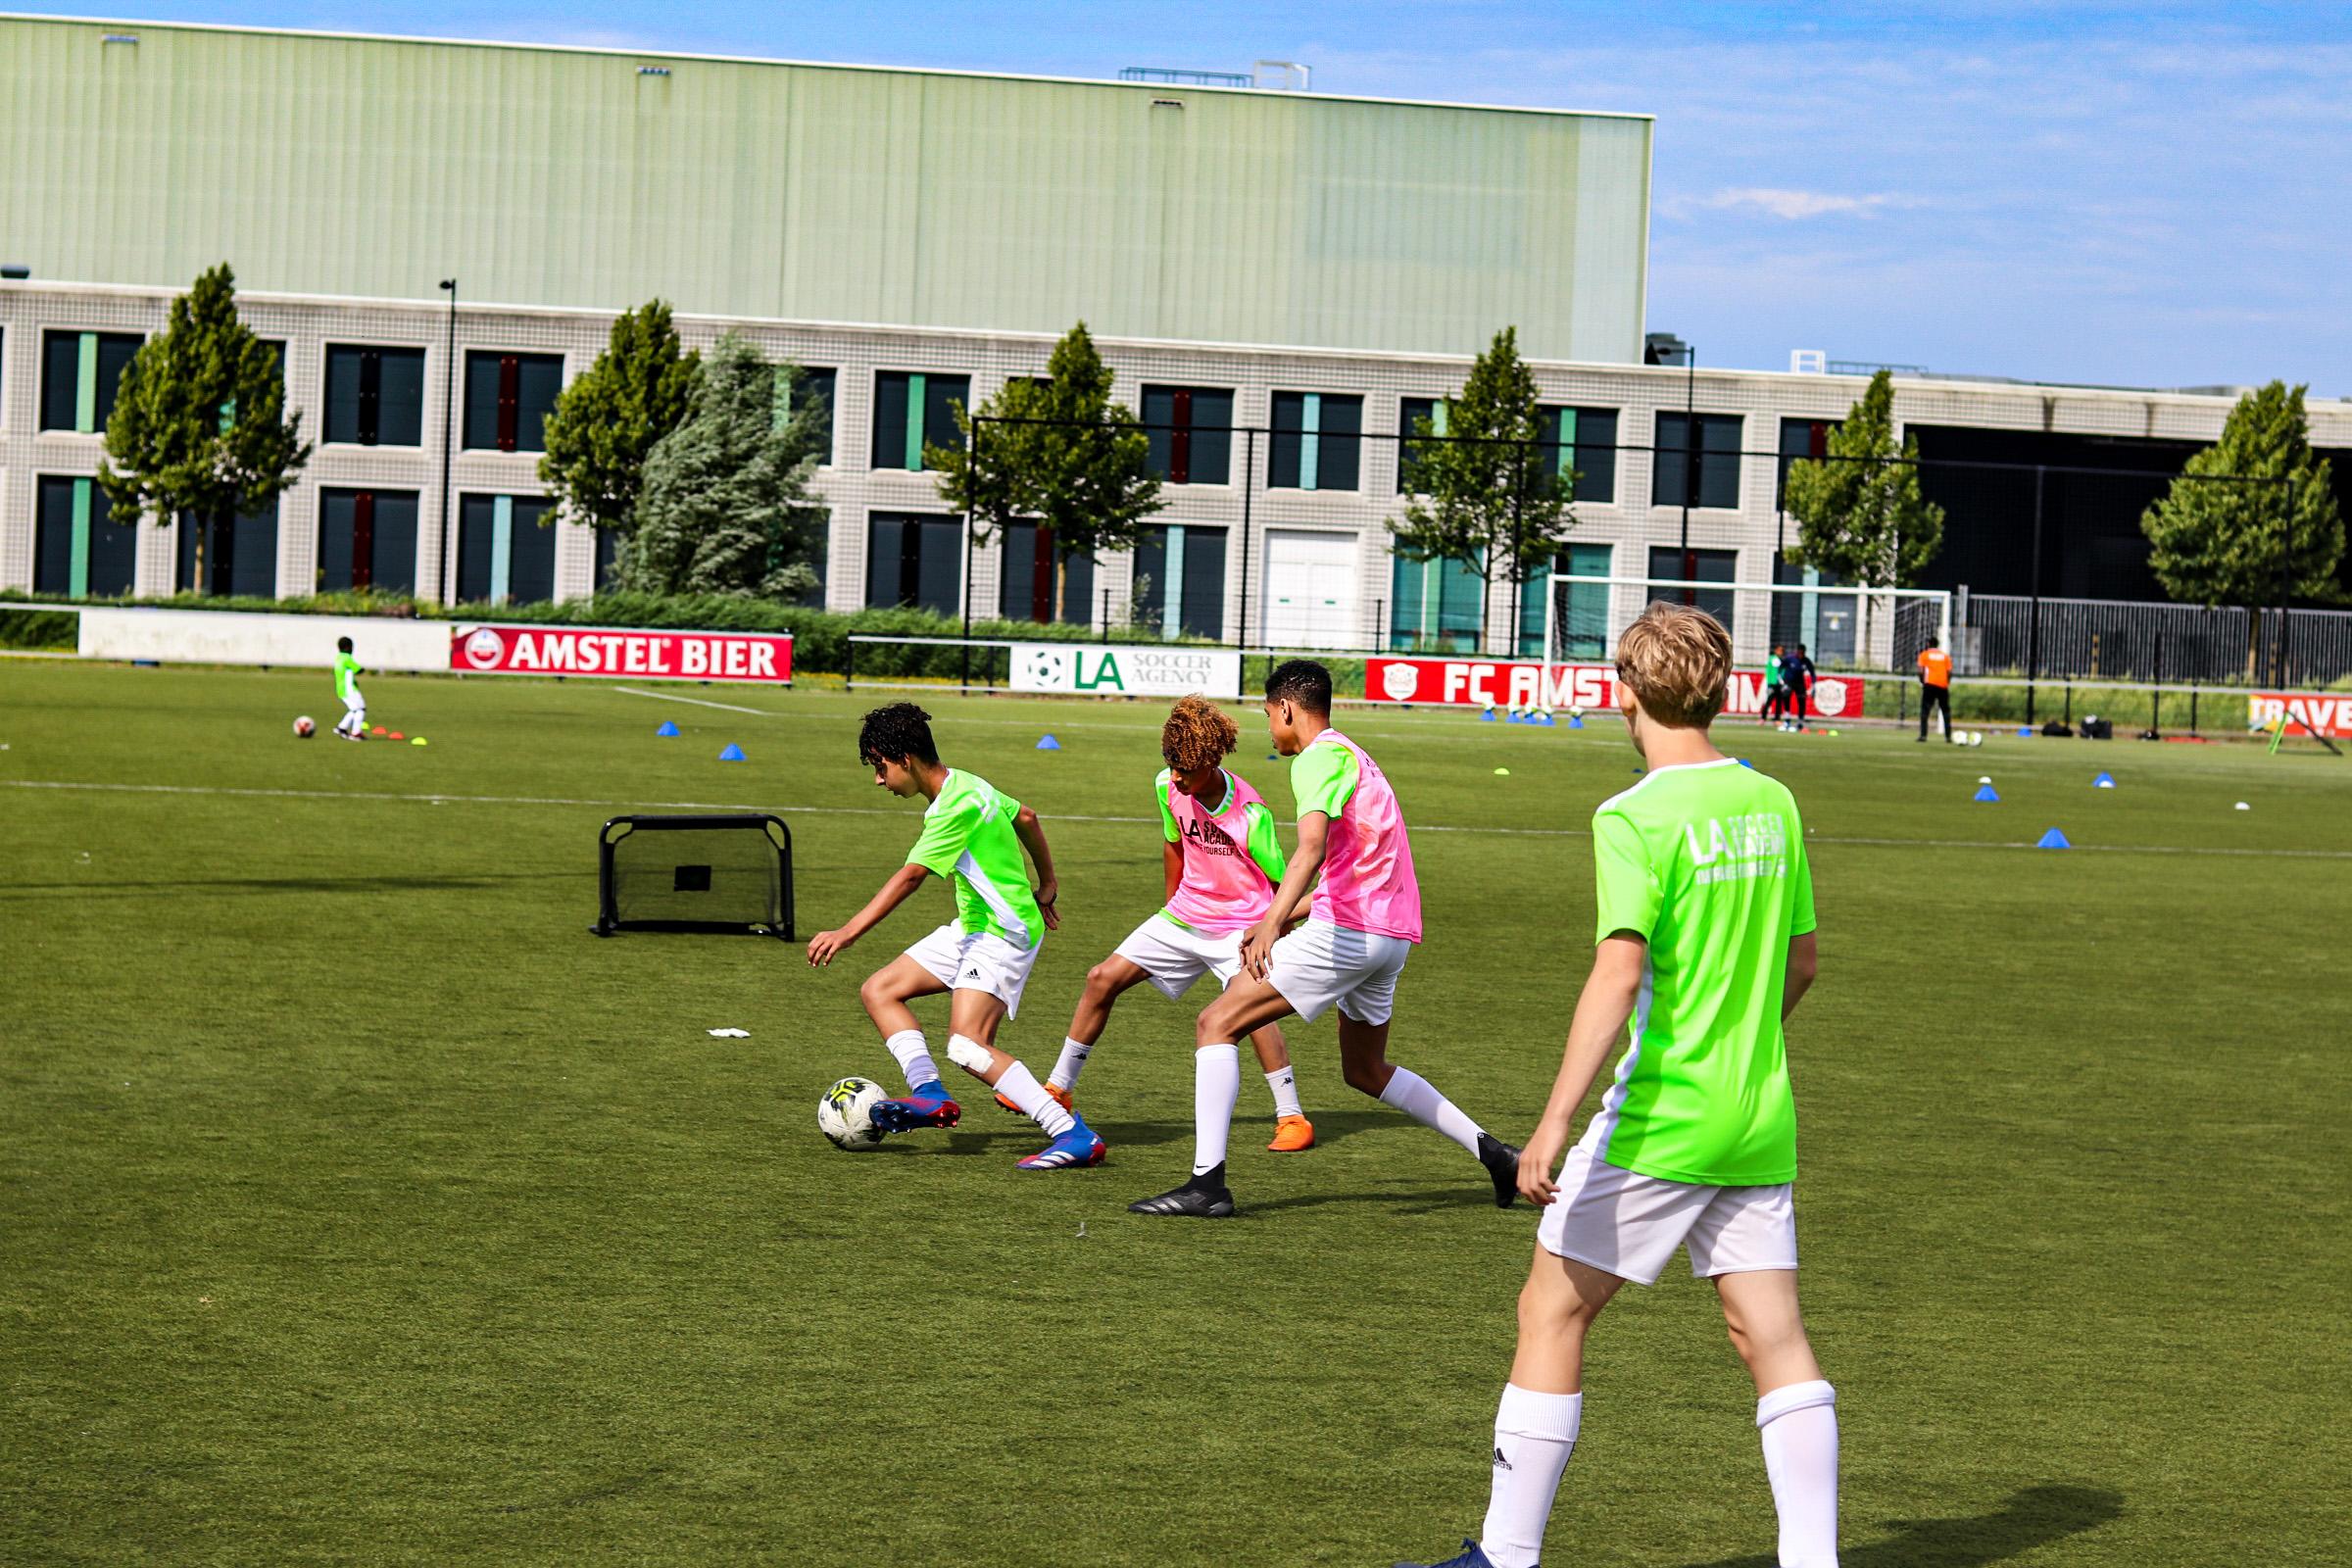 lasoccer-voetbaltraining-video